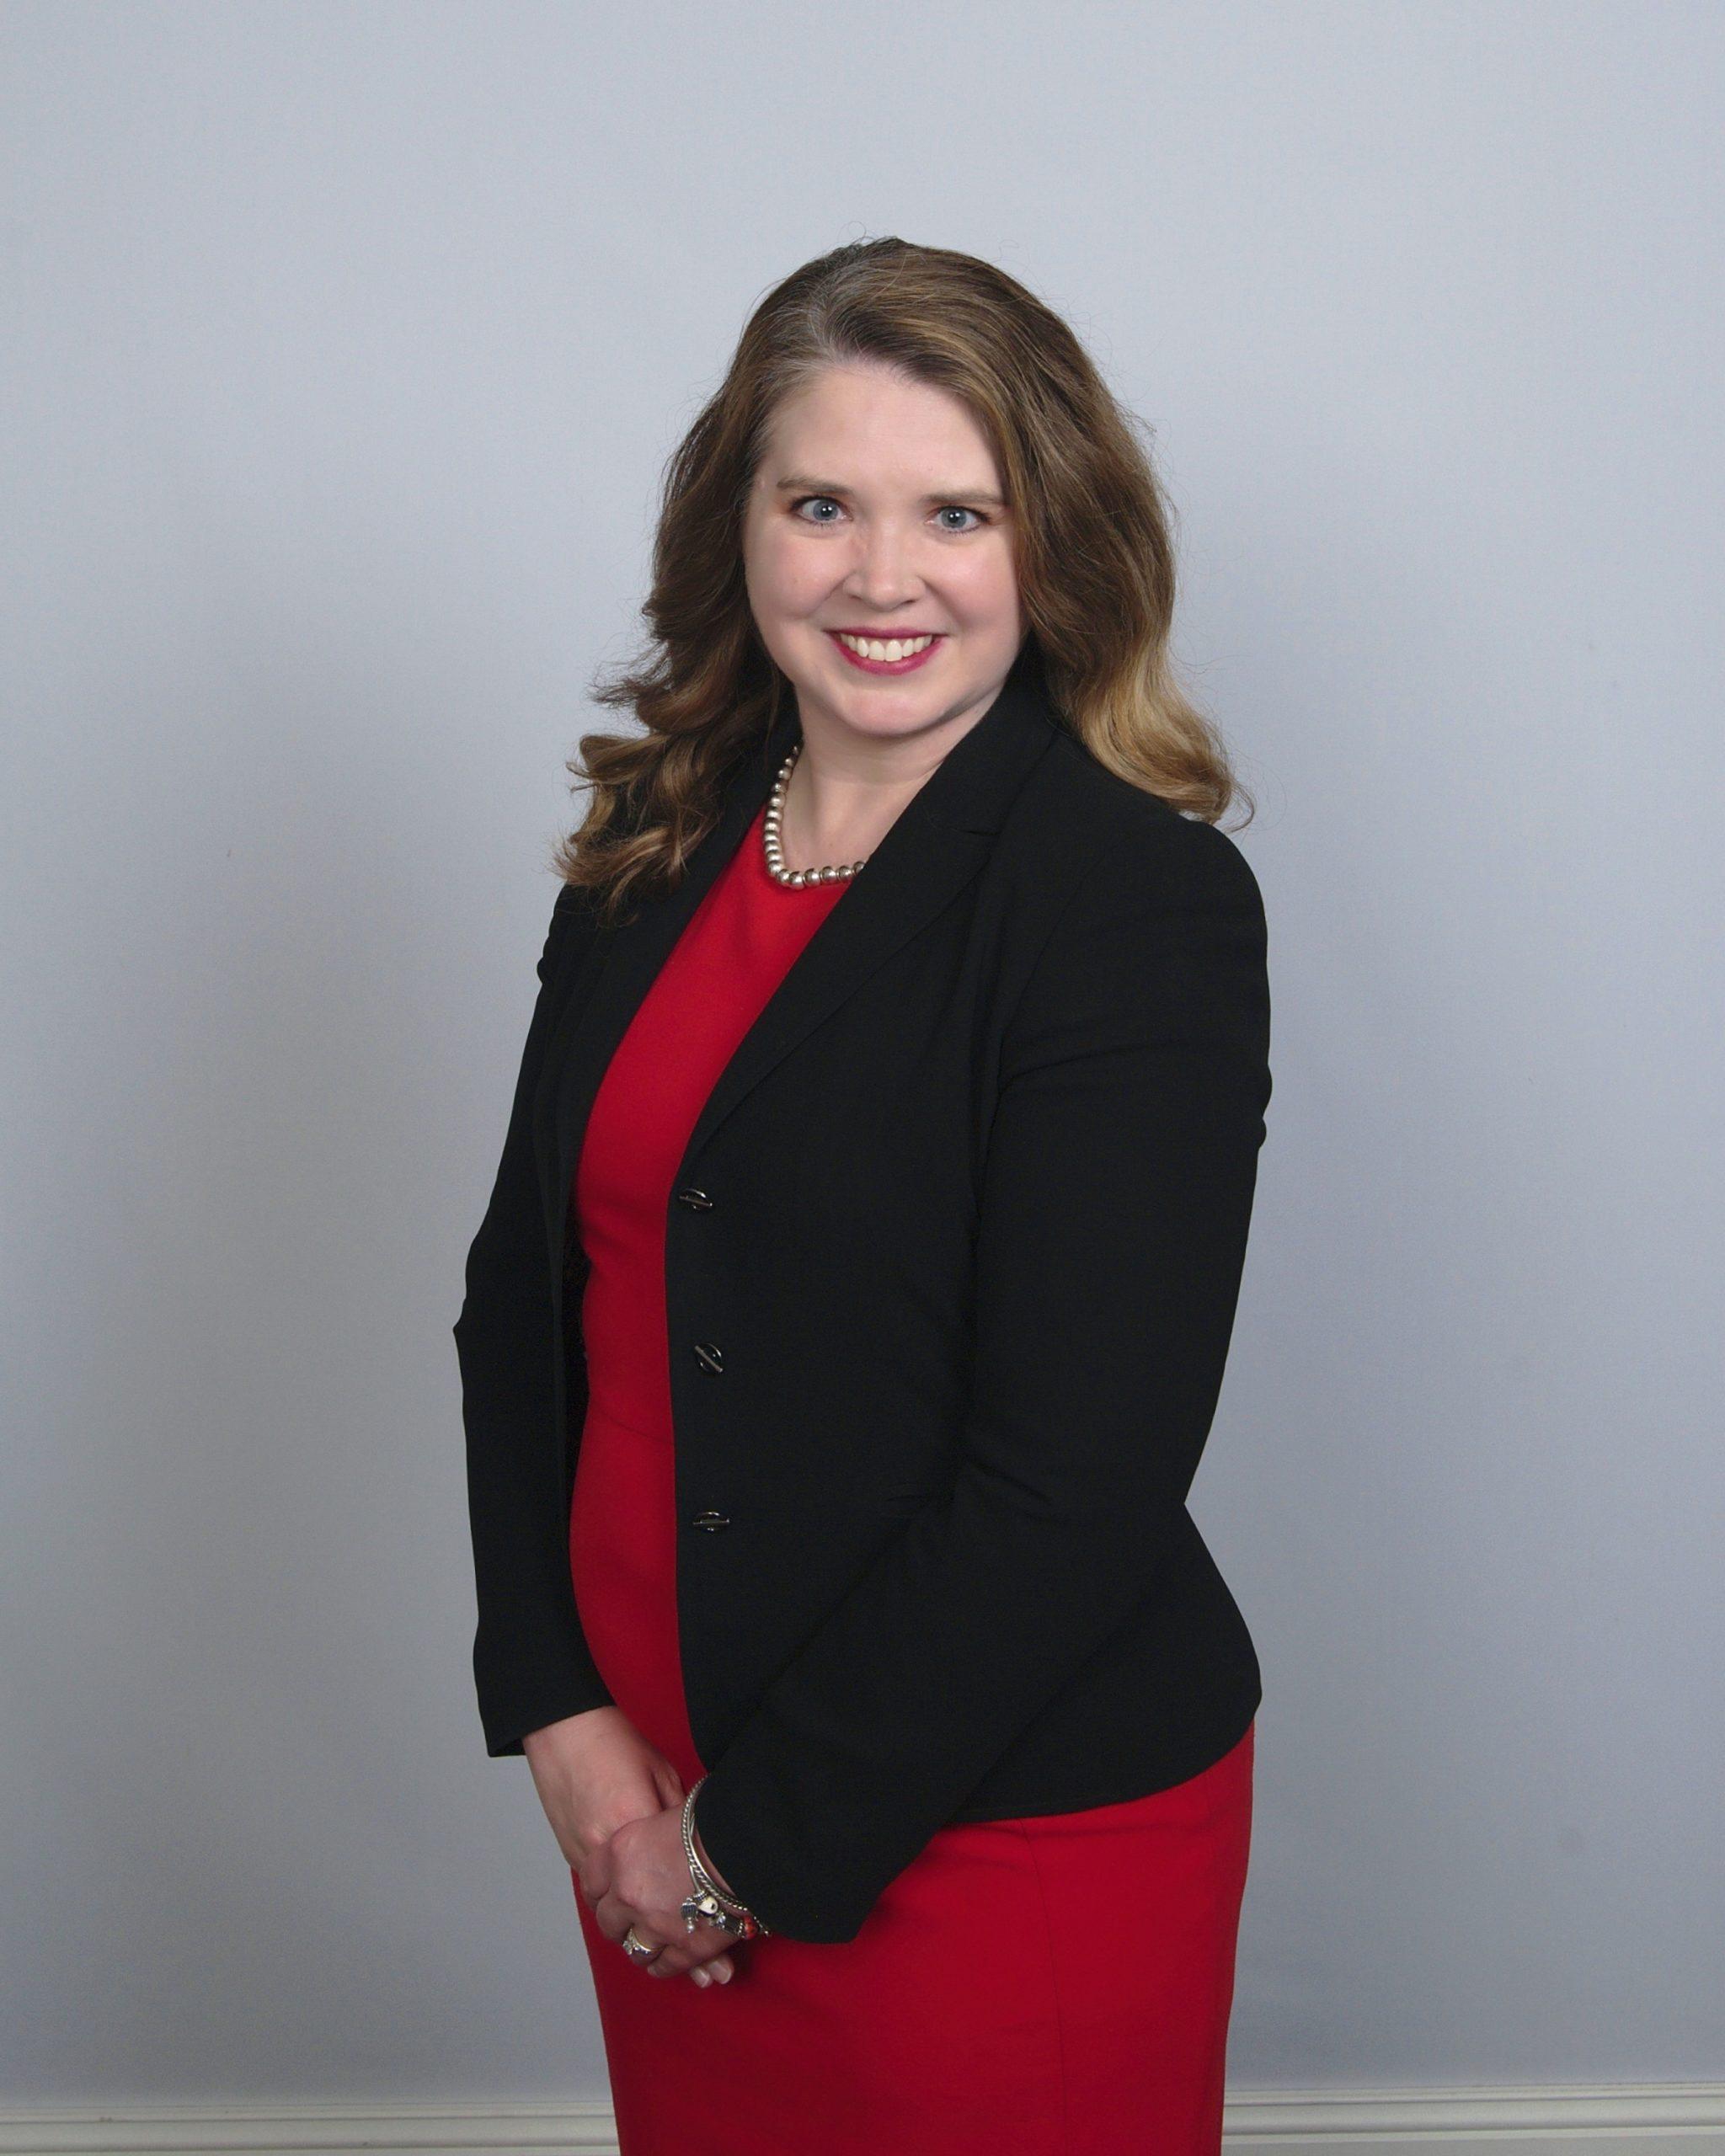 Miranda Holbrook